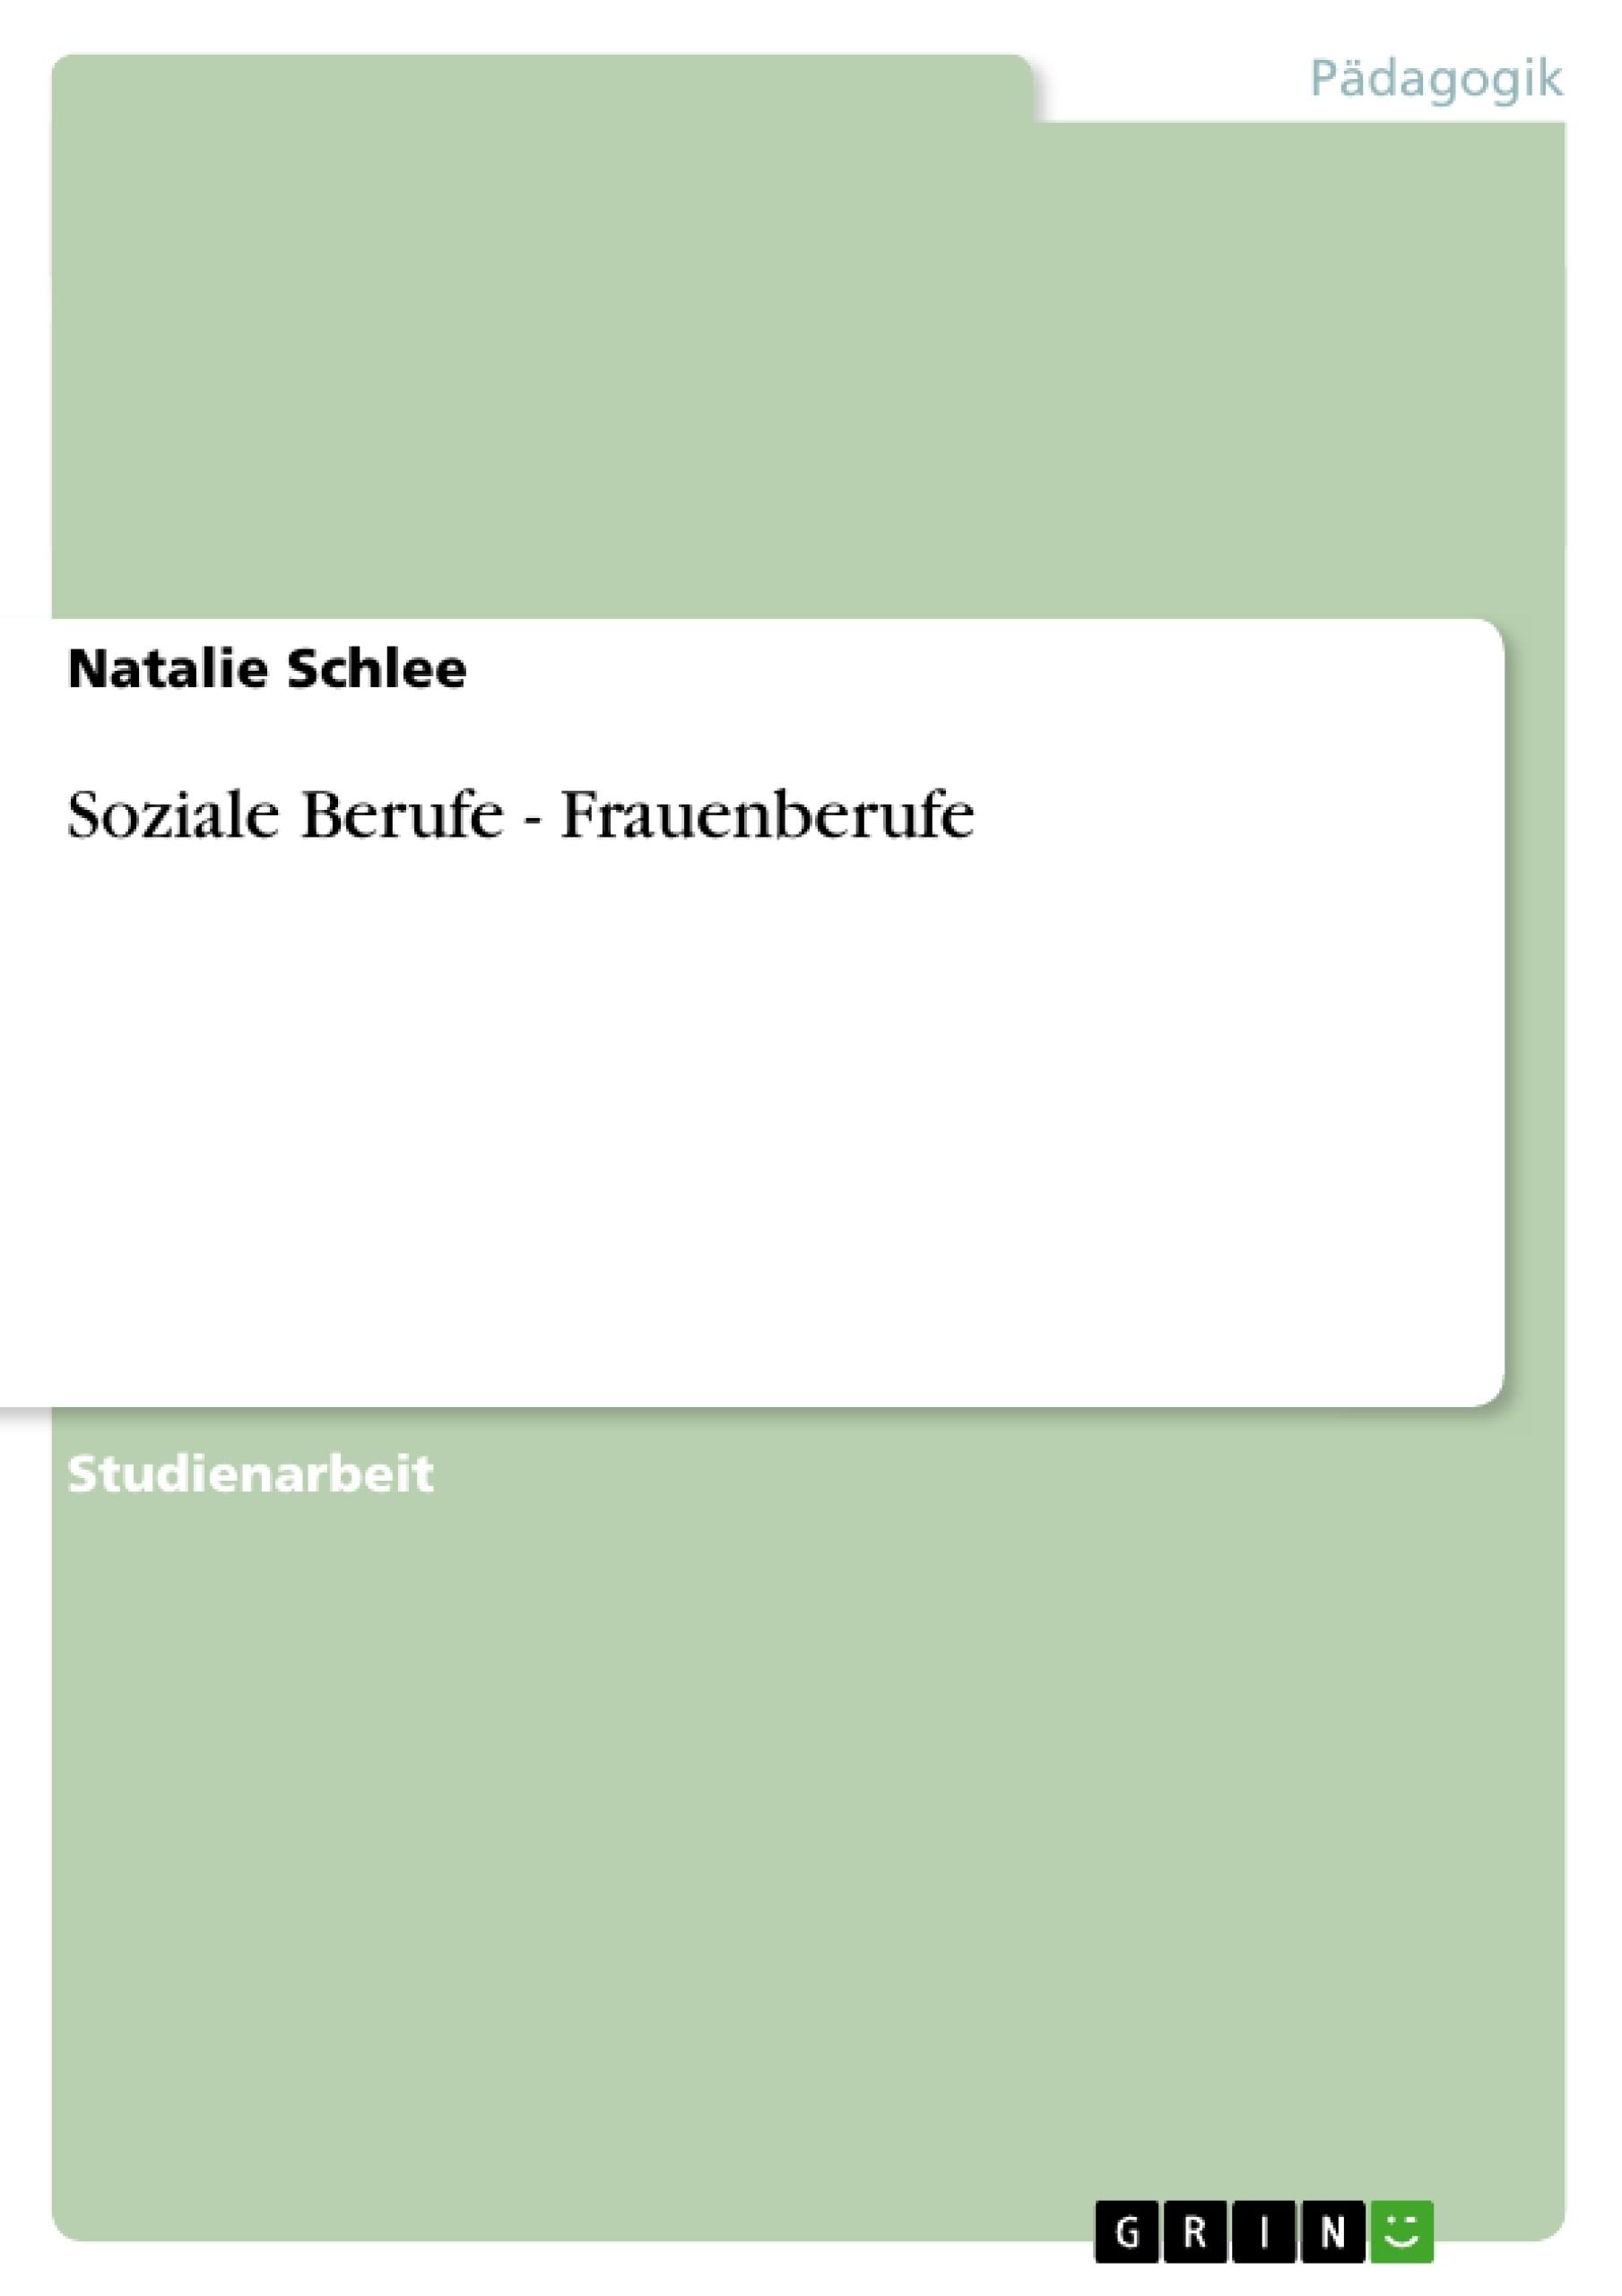 Titel: Soziale Berufe - Frauenberufe